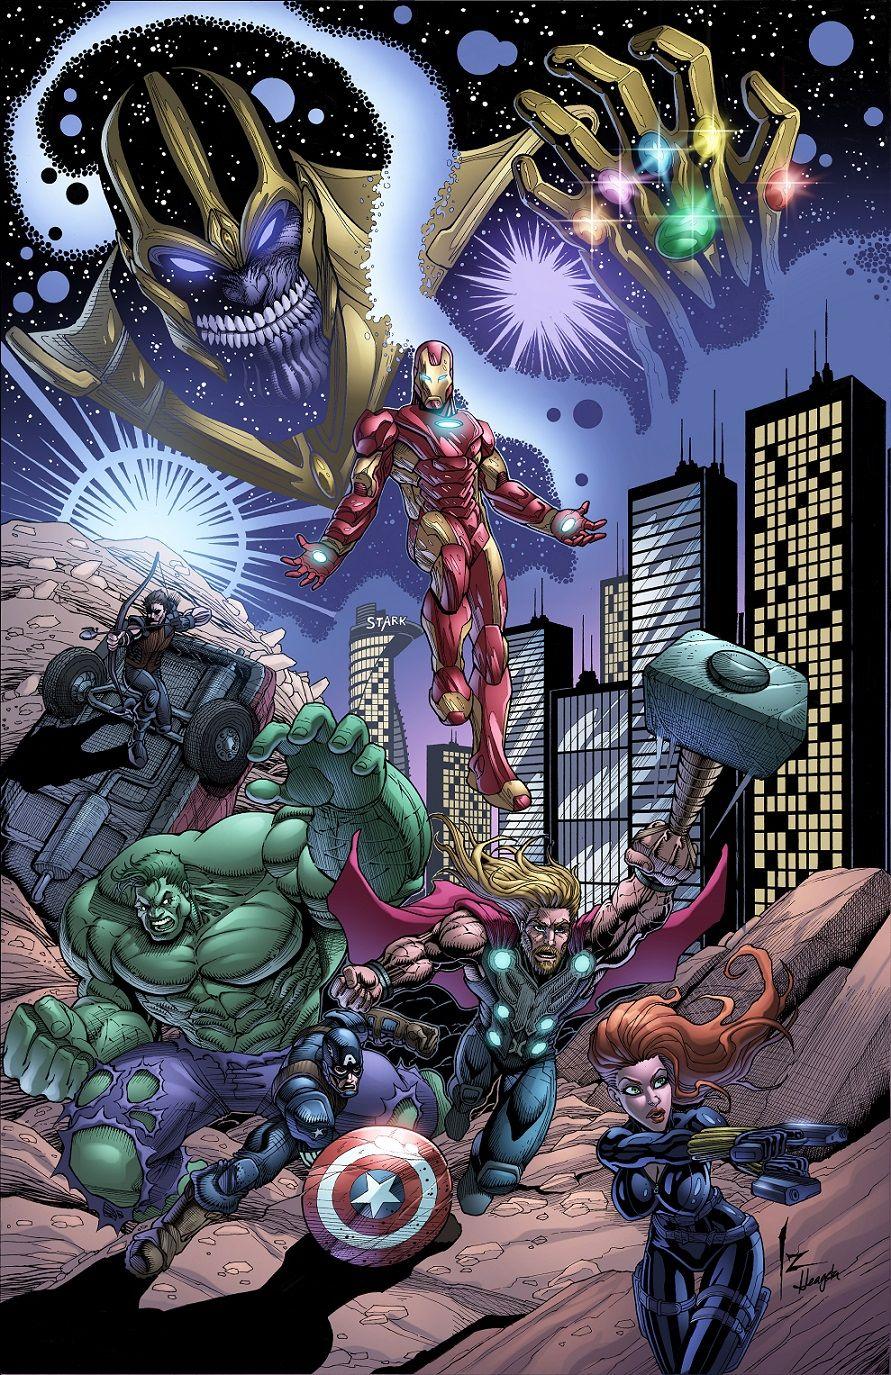 #Avengers #Fan #Art. (Avengers Vs Thanos) By: Izik Bell. (THE * 5 * STÅR *  ÅWARD * OF: * AW YEAH, IT'S MAJOR ÅWESOMENESS!!!™)[THANK U 4 PINNING!!!